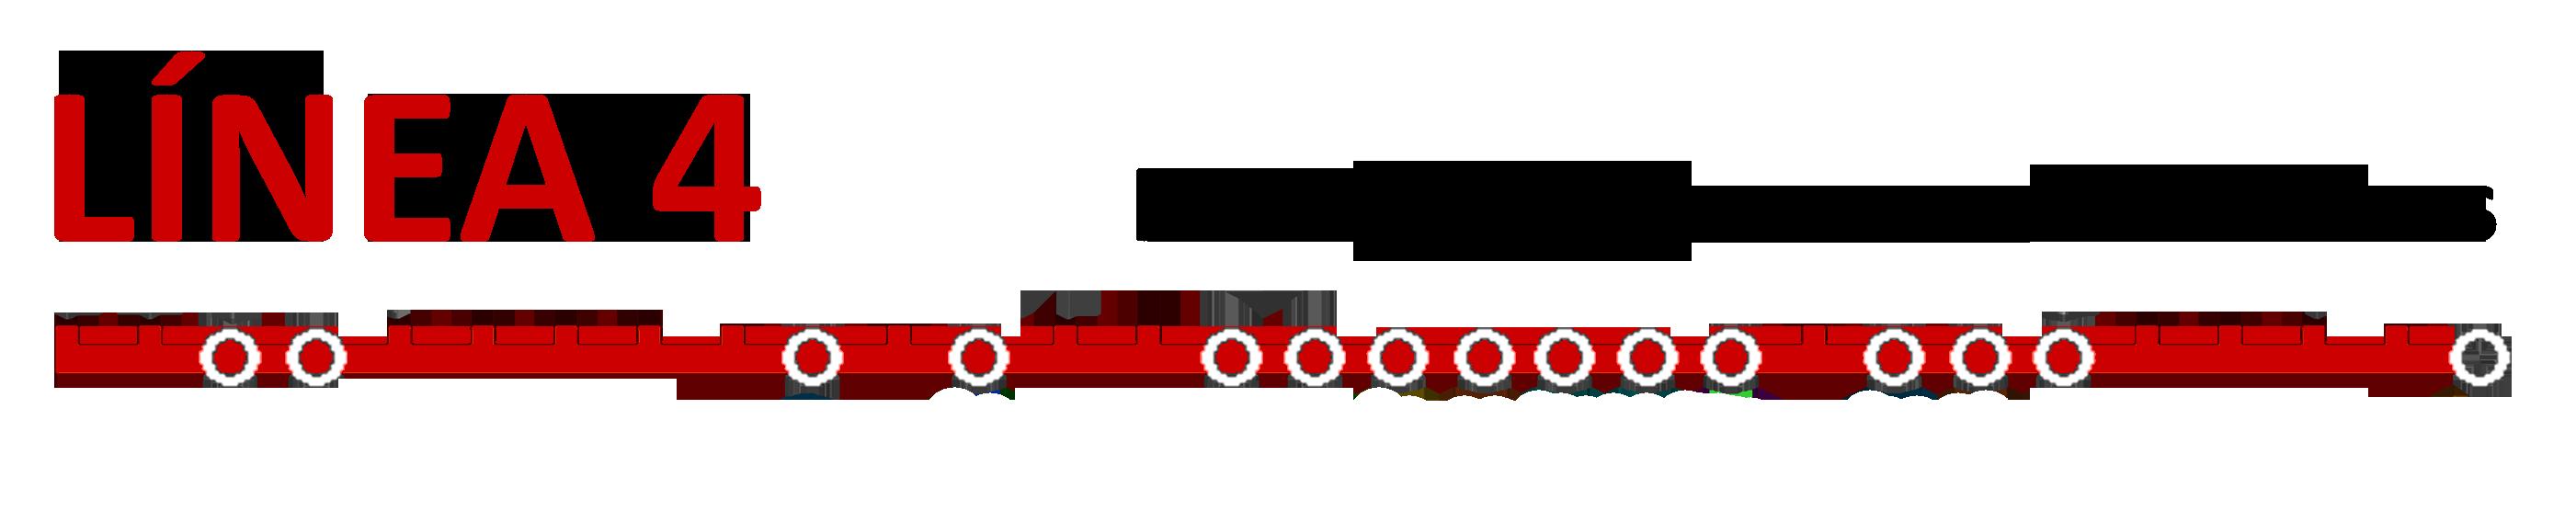 Linea4_web